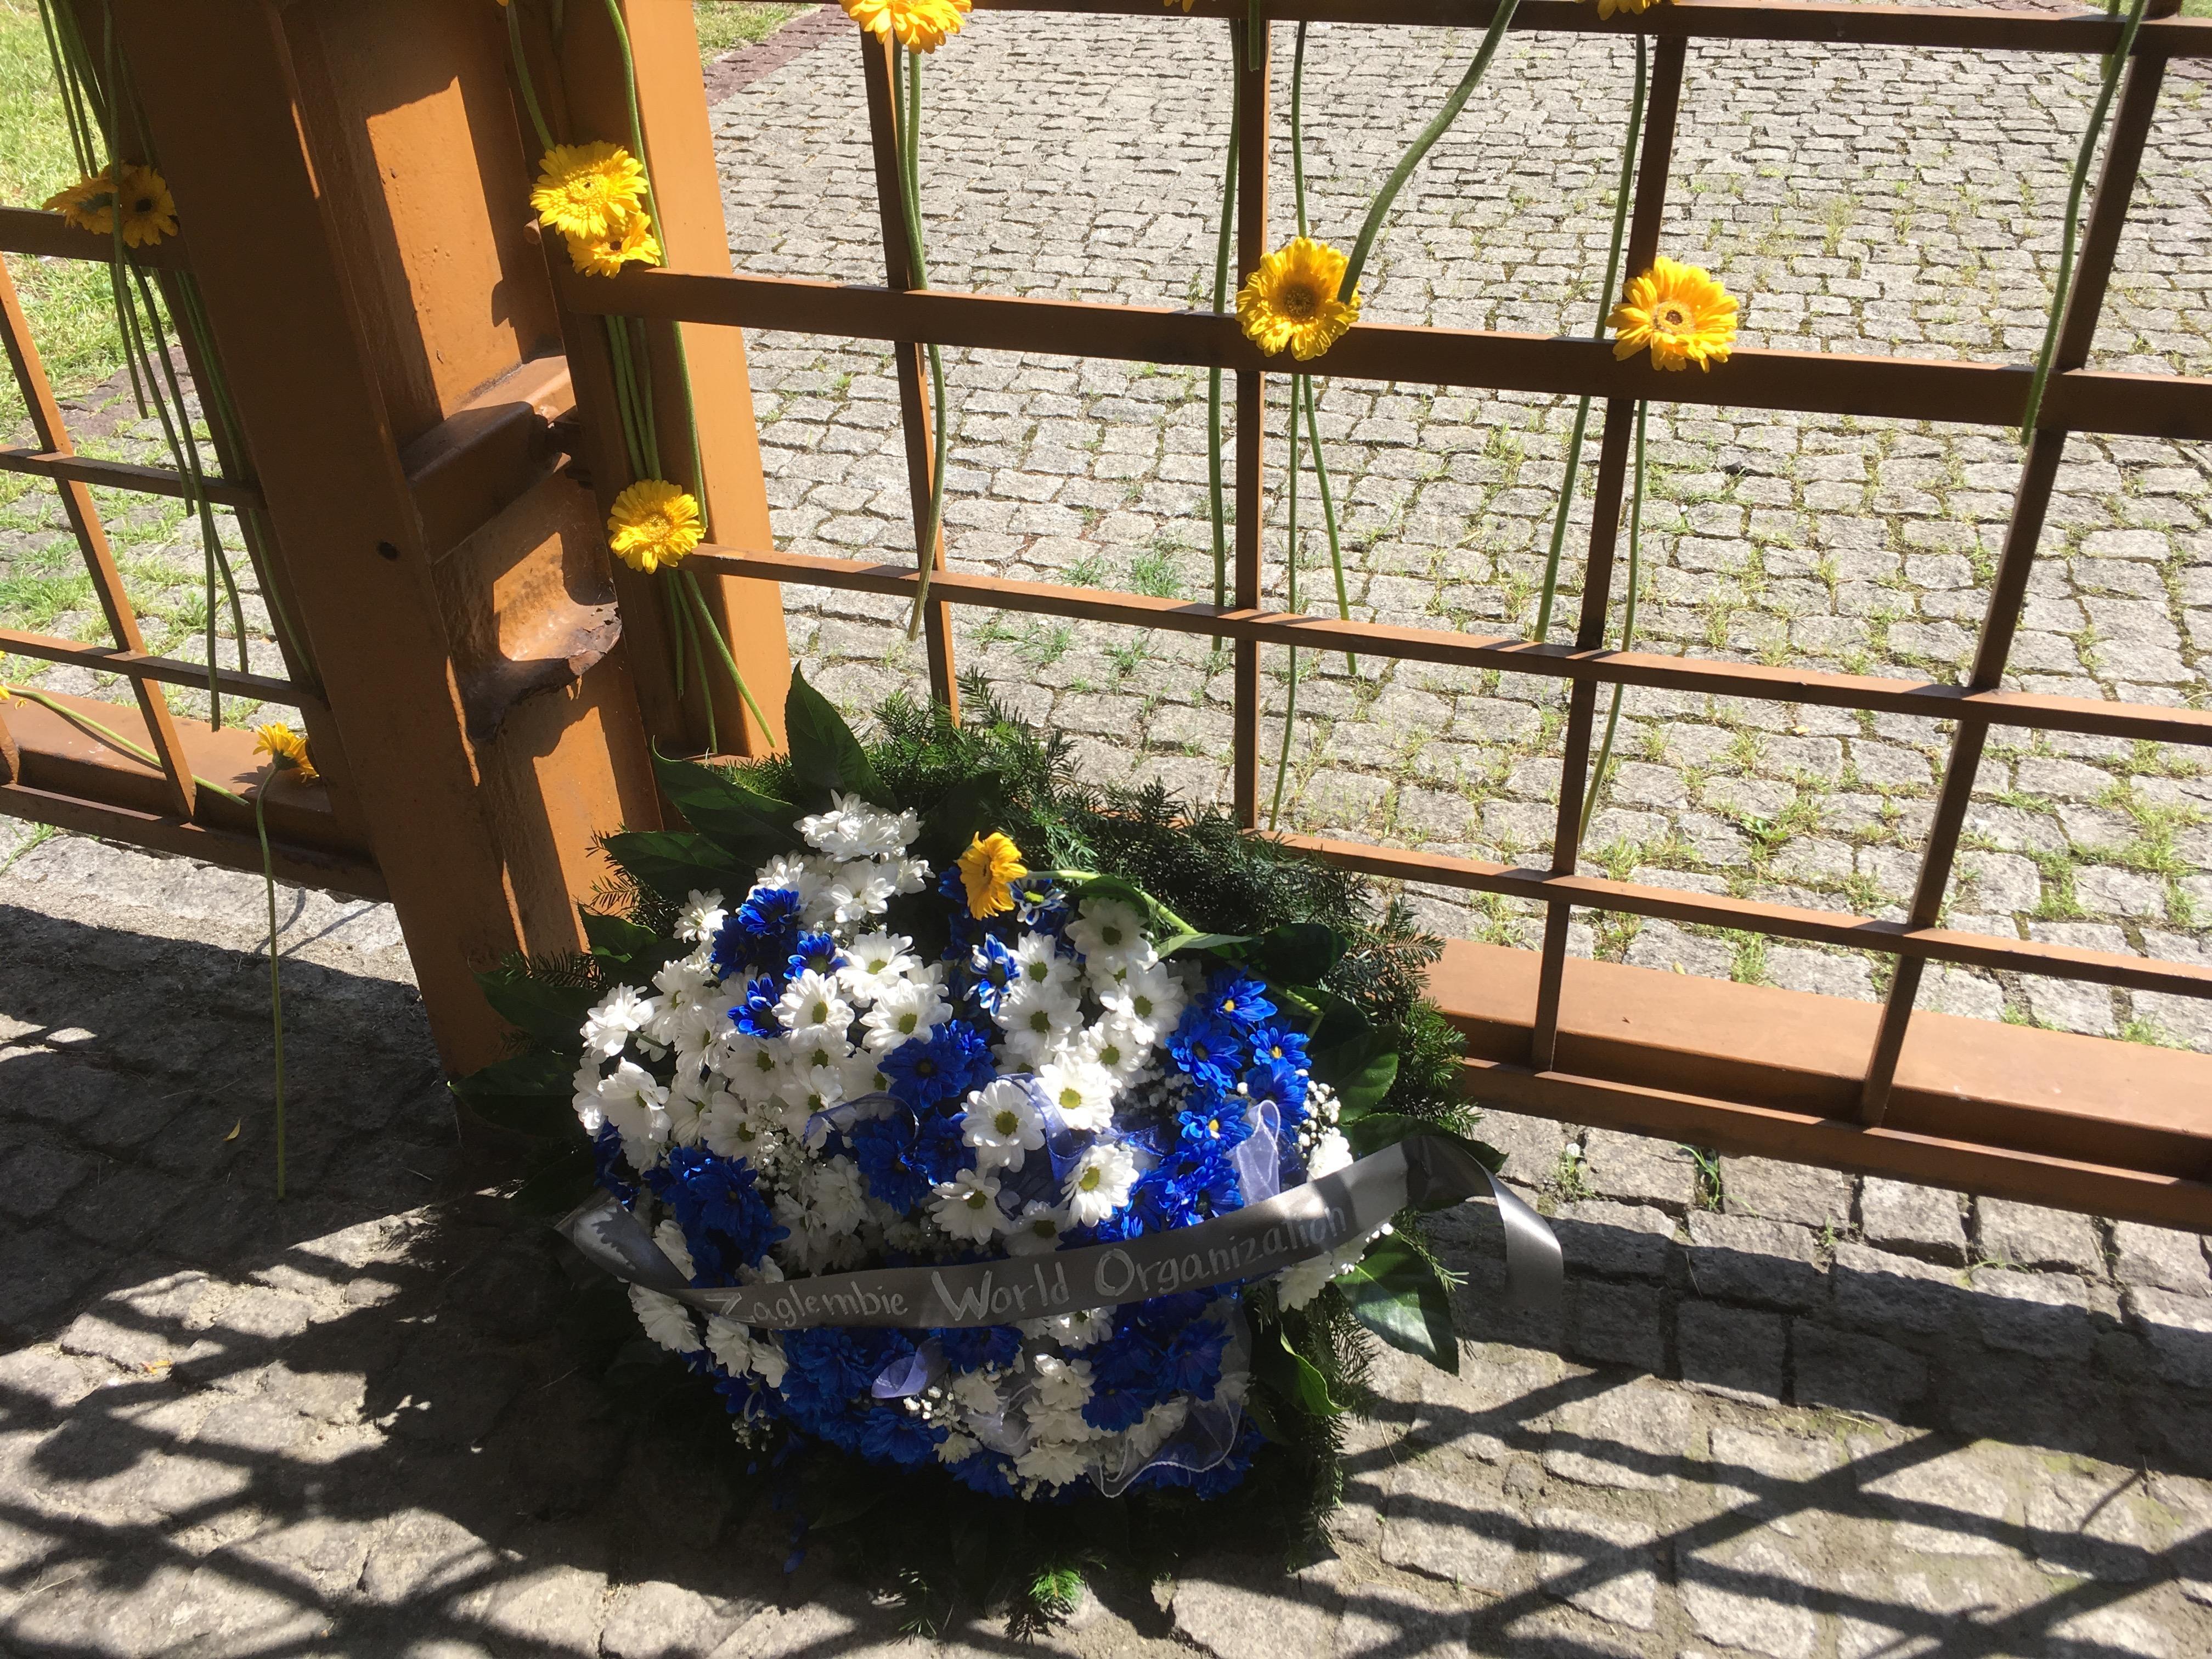 Fig 4 Flowers at Bedzin railway station 2 August 2018